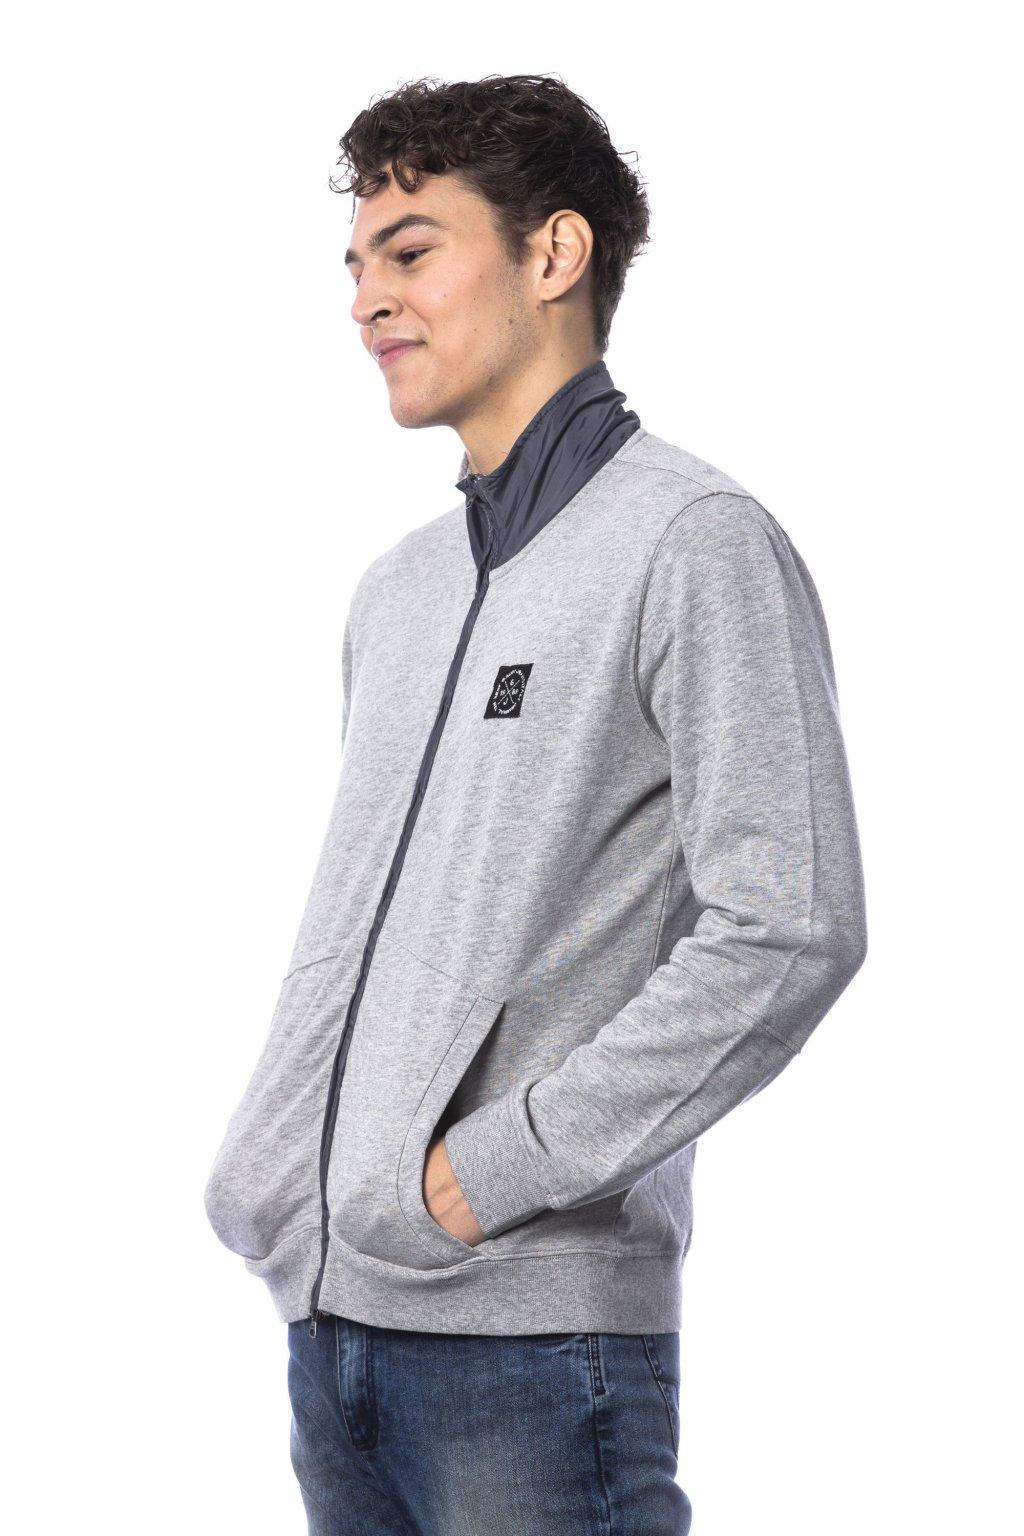 znackova panska mikina Gaudi Jeans grey (4)